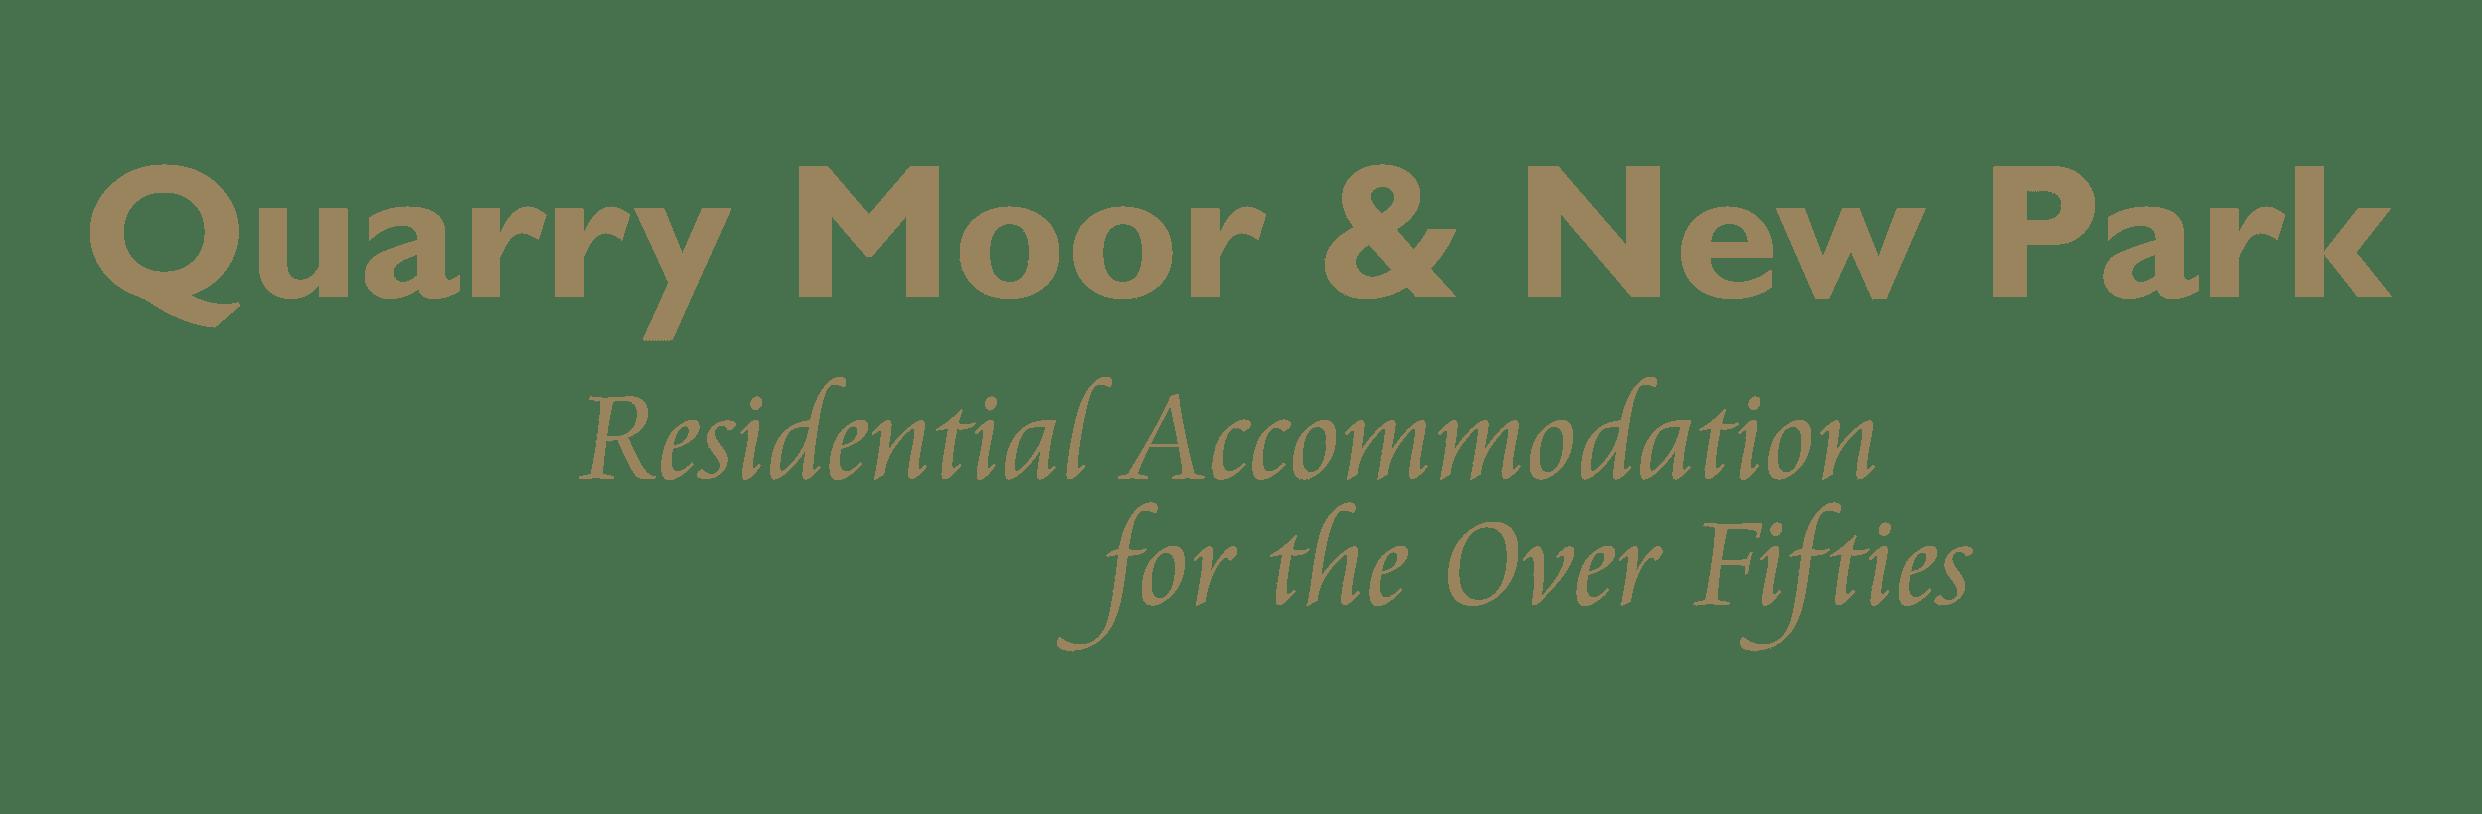 Quarry Moor New Park Logo